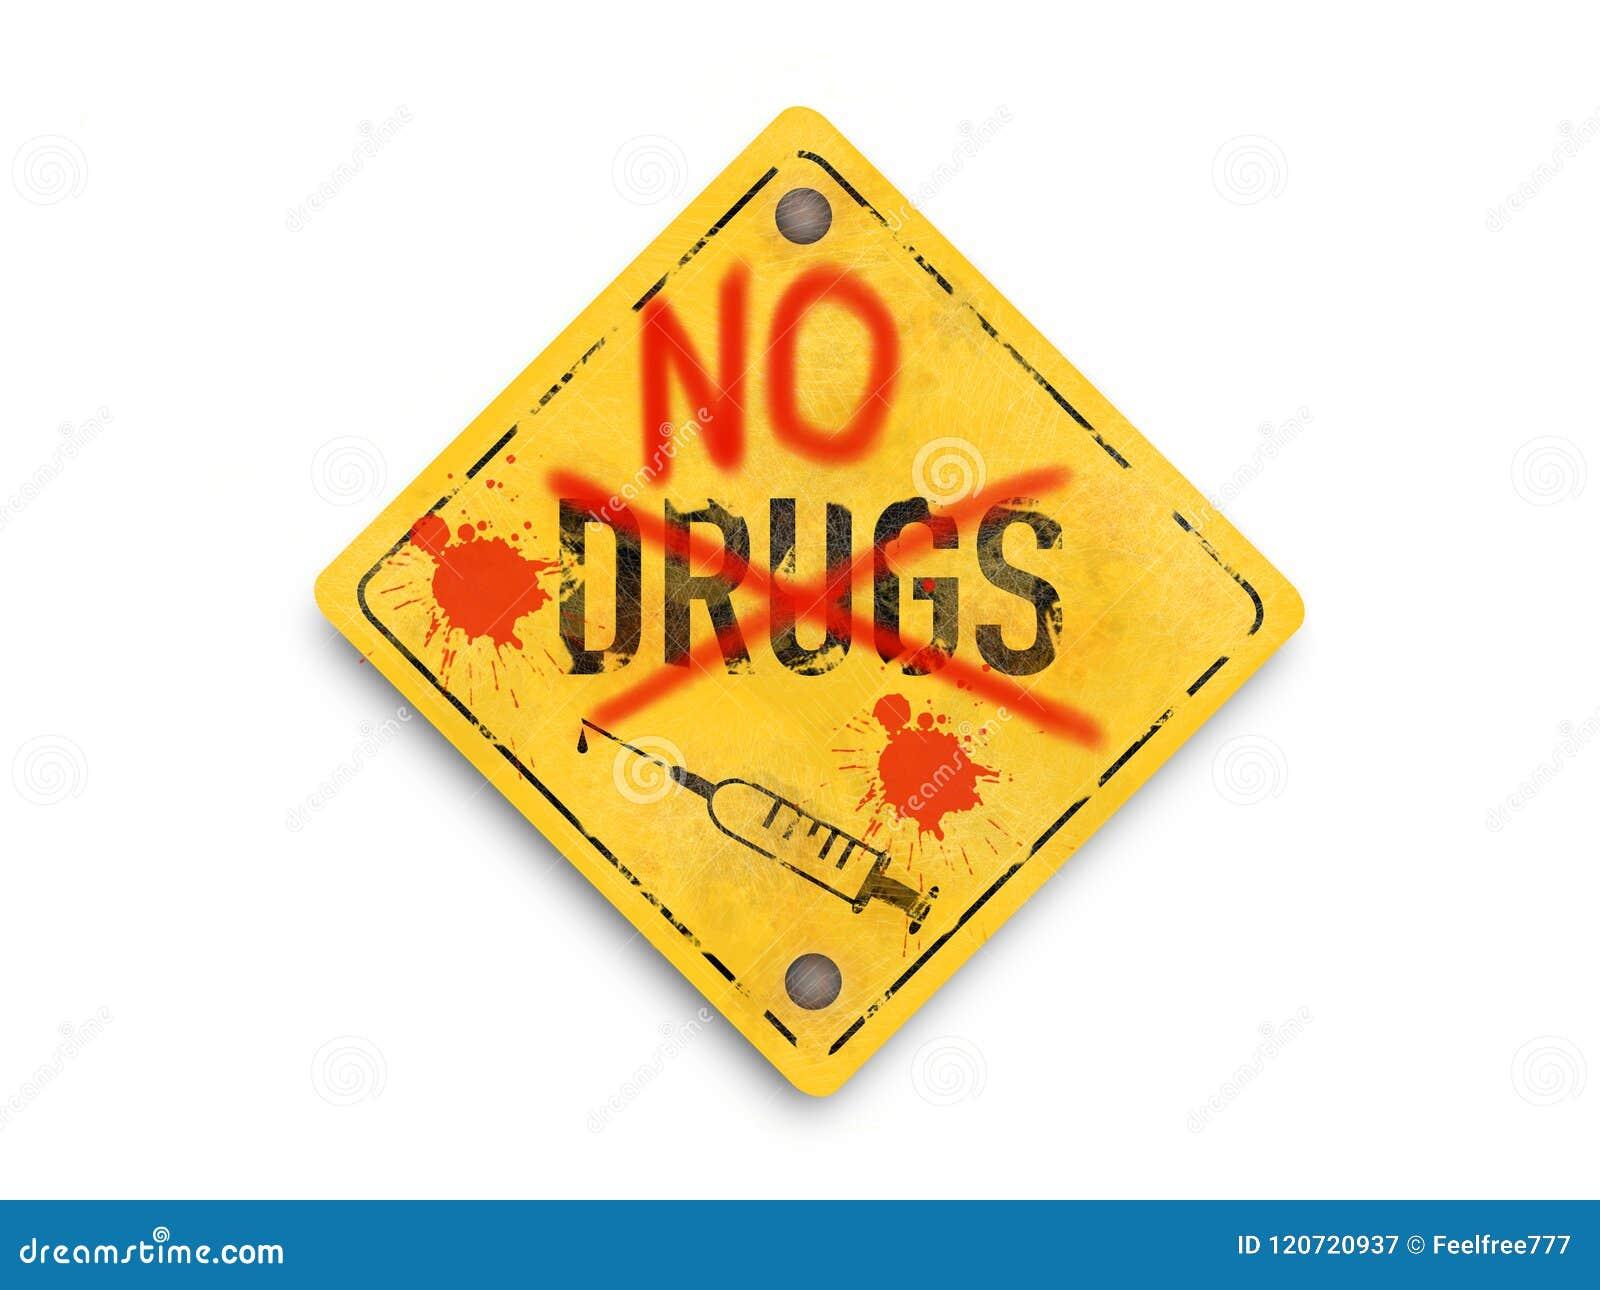 Geen drugs, spuit, artistiek stijlembleem, super kwaliteits abstracte bedrijfsaffiche